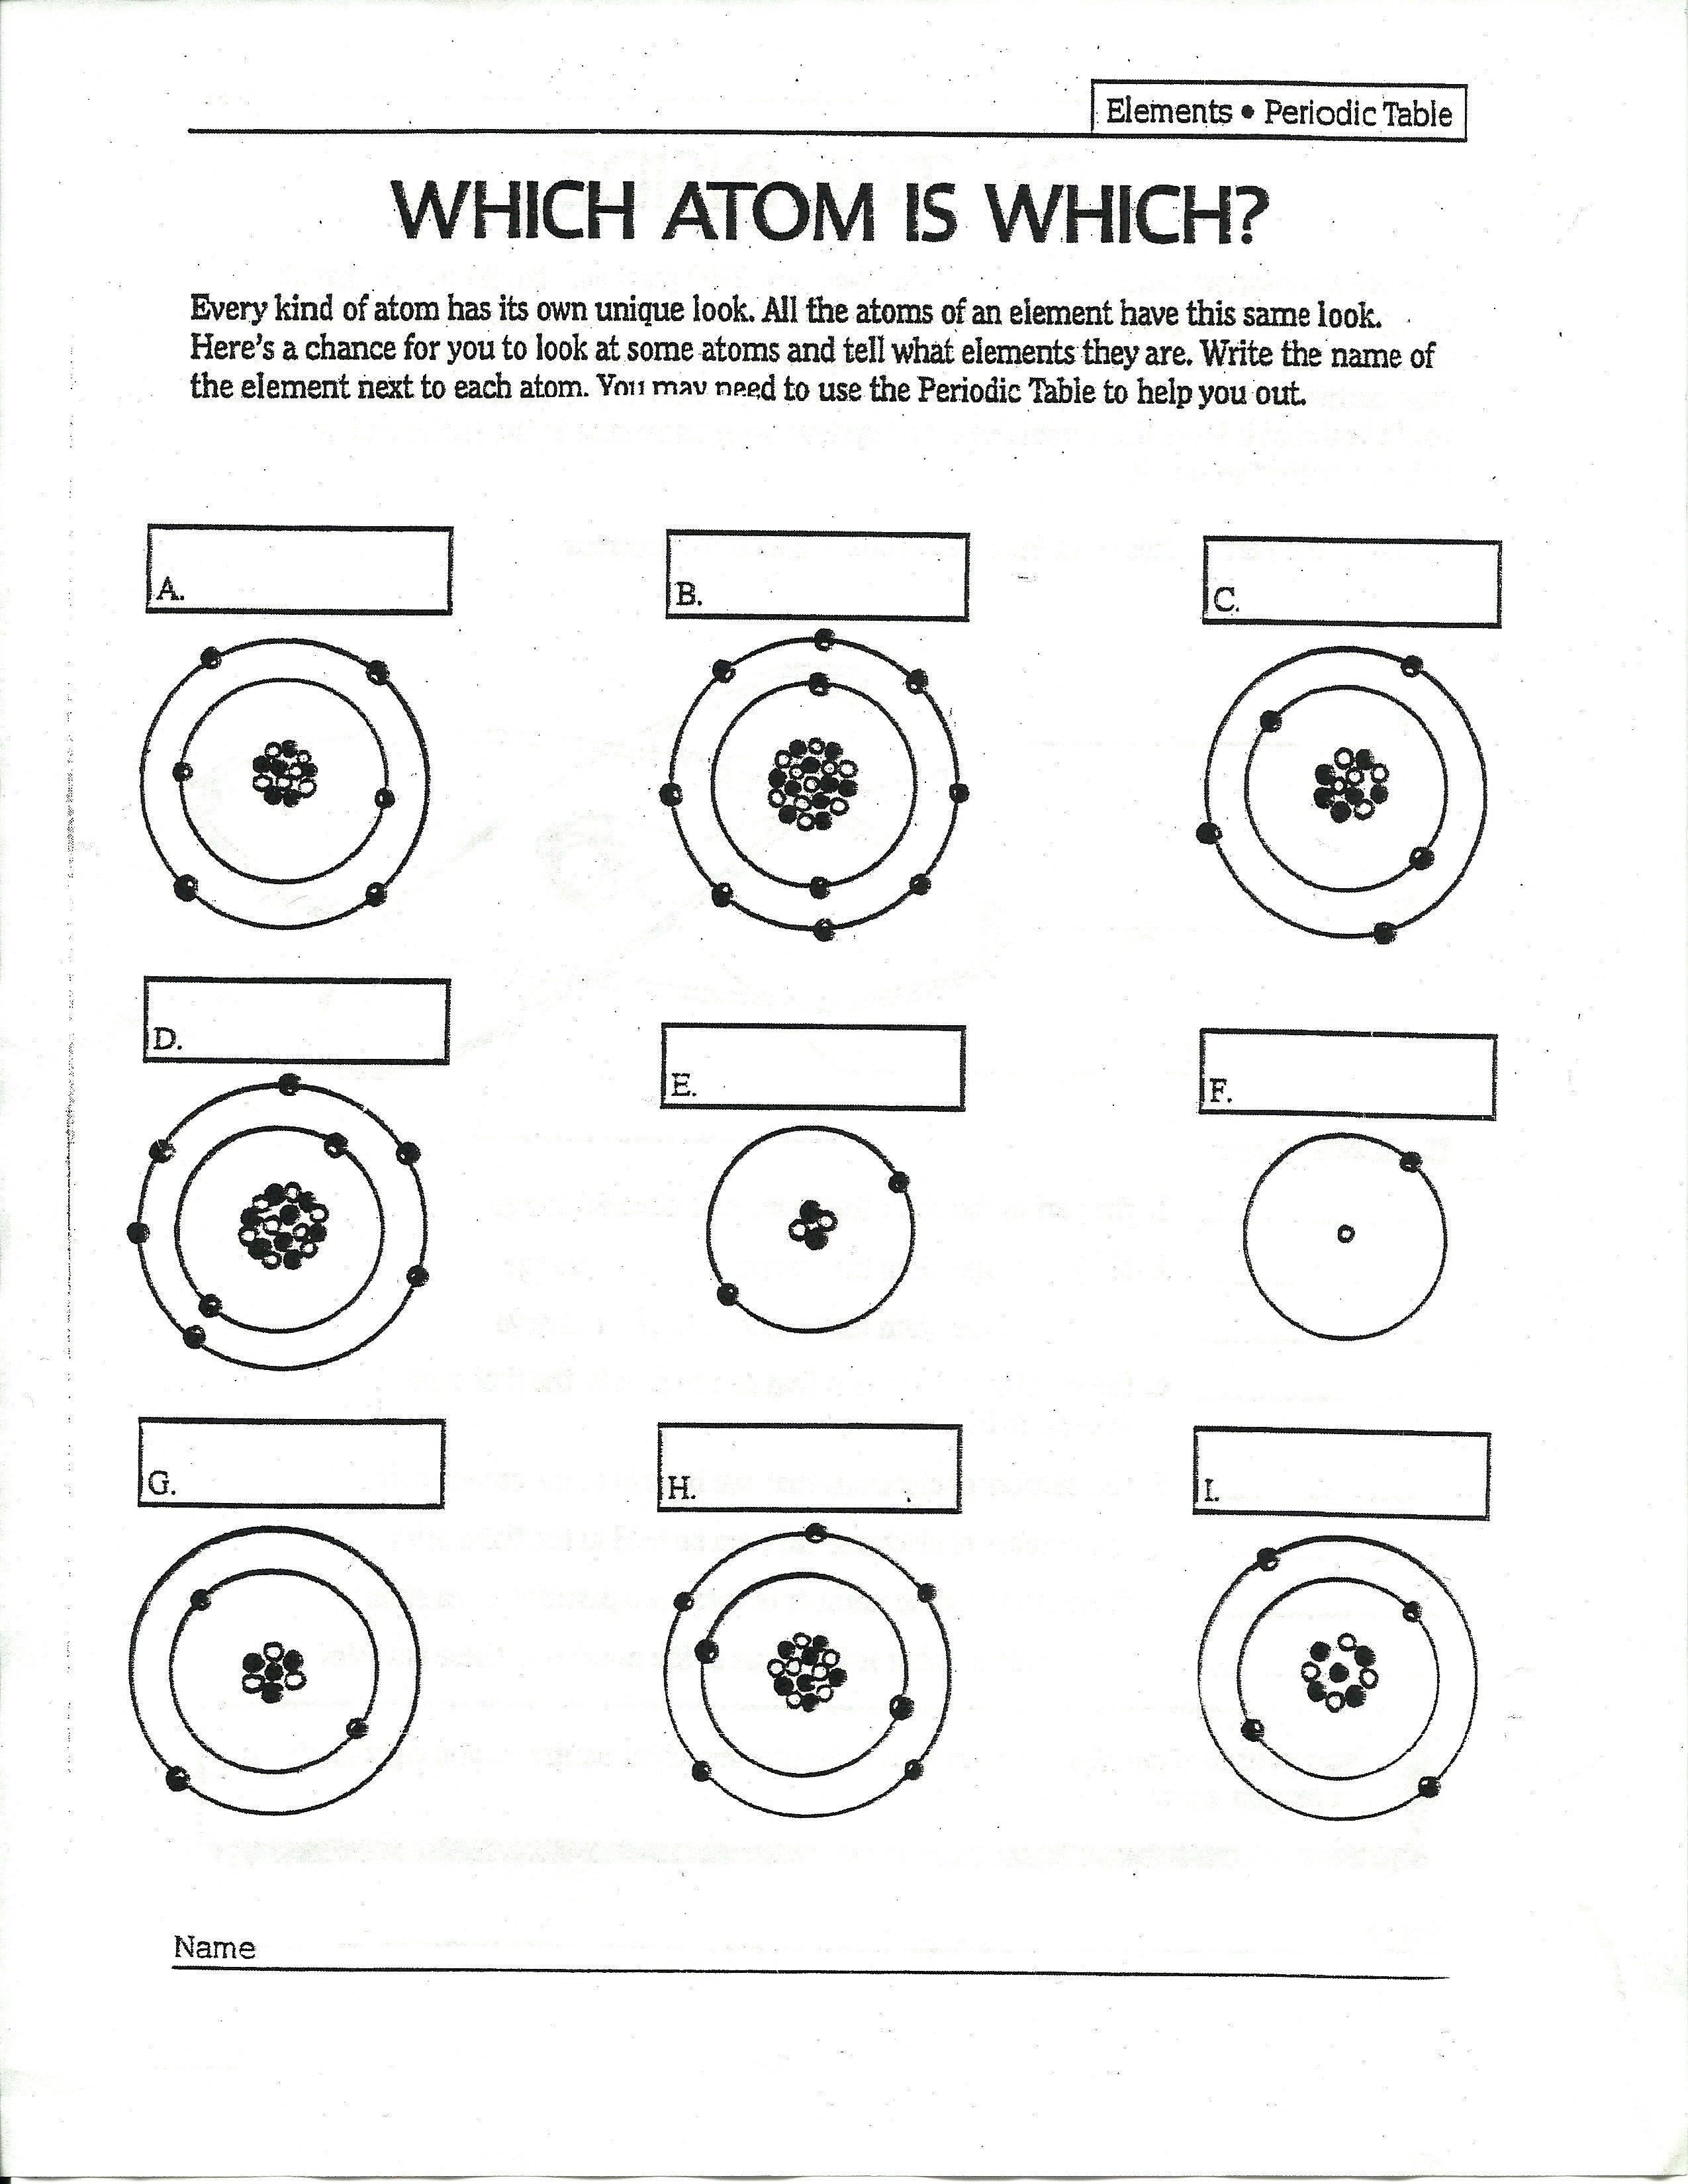 43 Atoms Worksheet, Atomic Model Worksheet Atomic Models Free Worksheets Samples